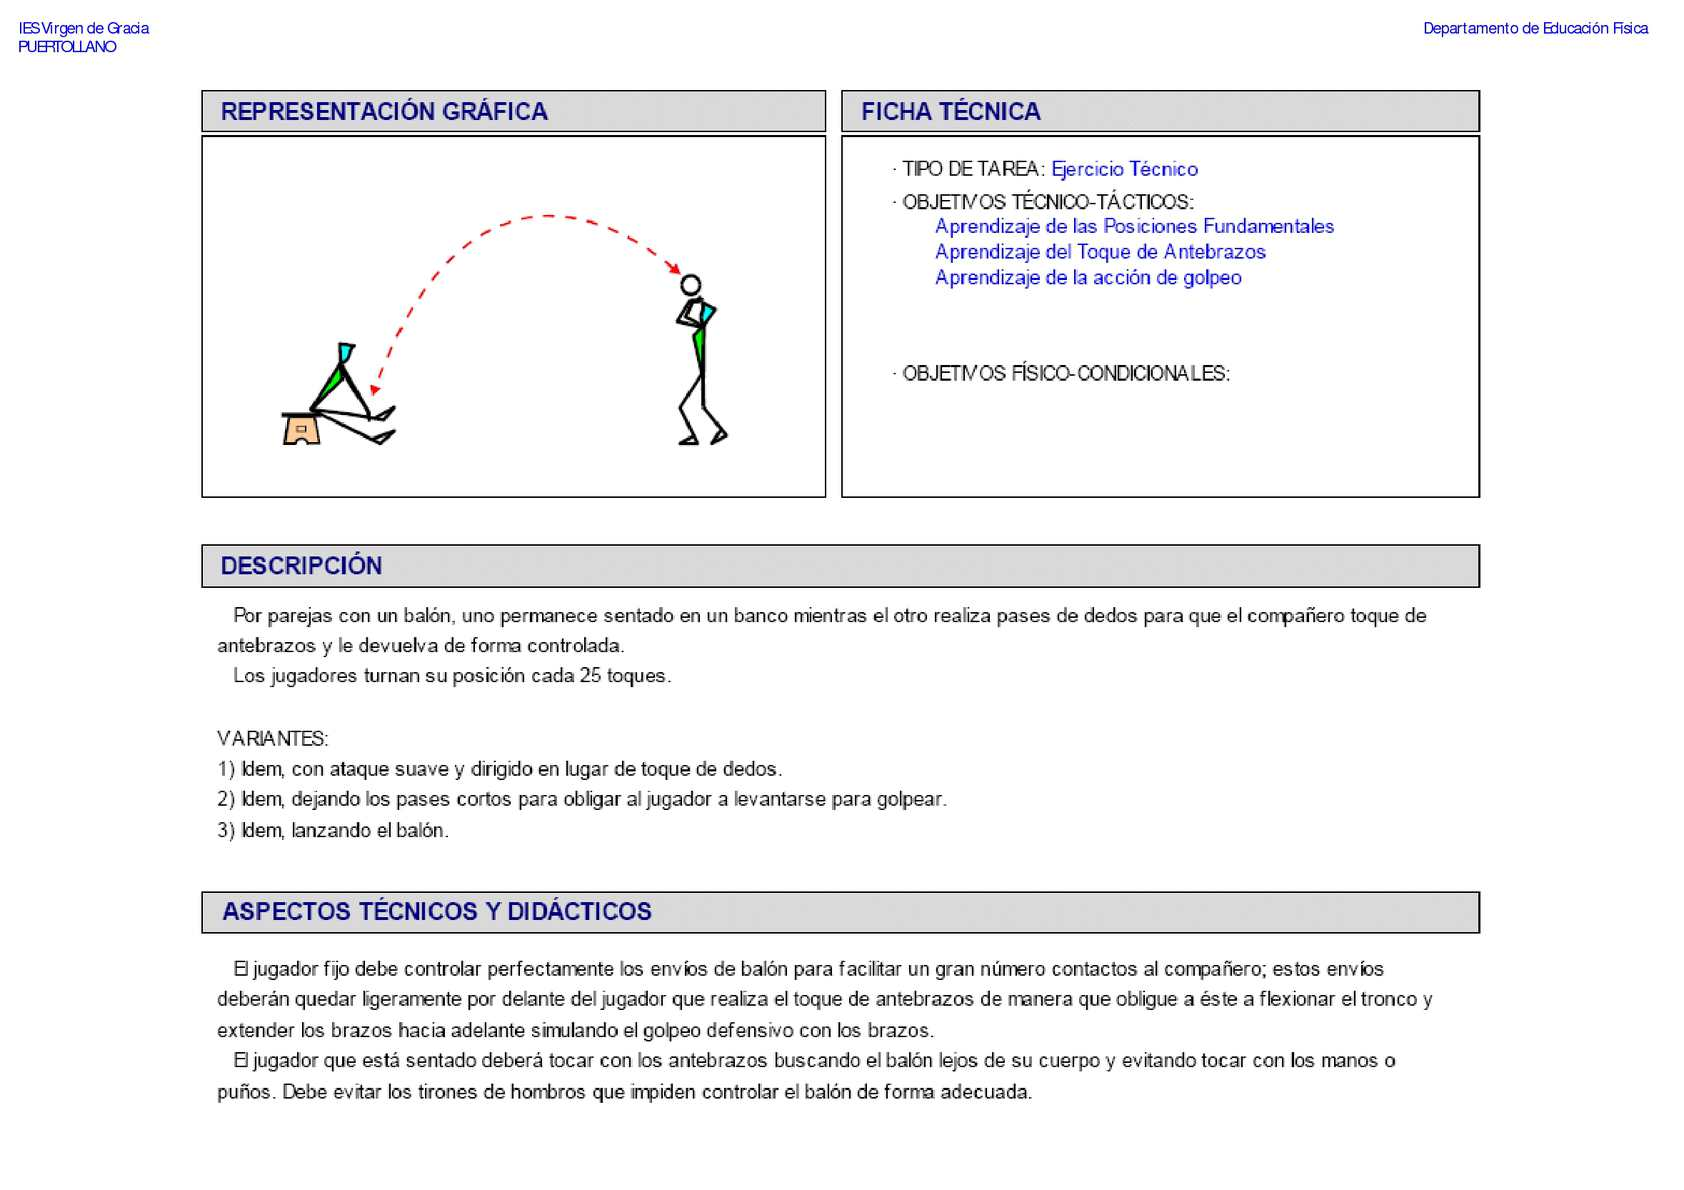 bc6578239f VOLEIBOL - Posiciones fundamentales - CALAMEO Downloader